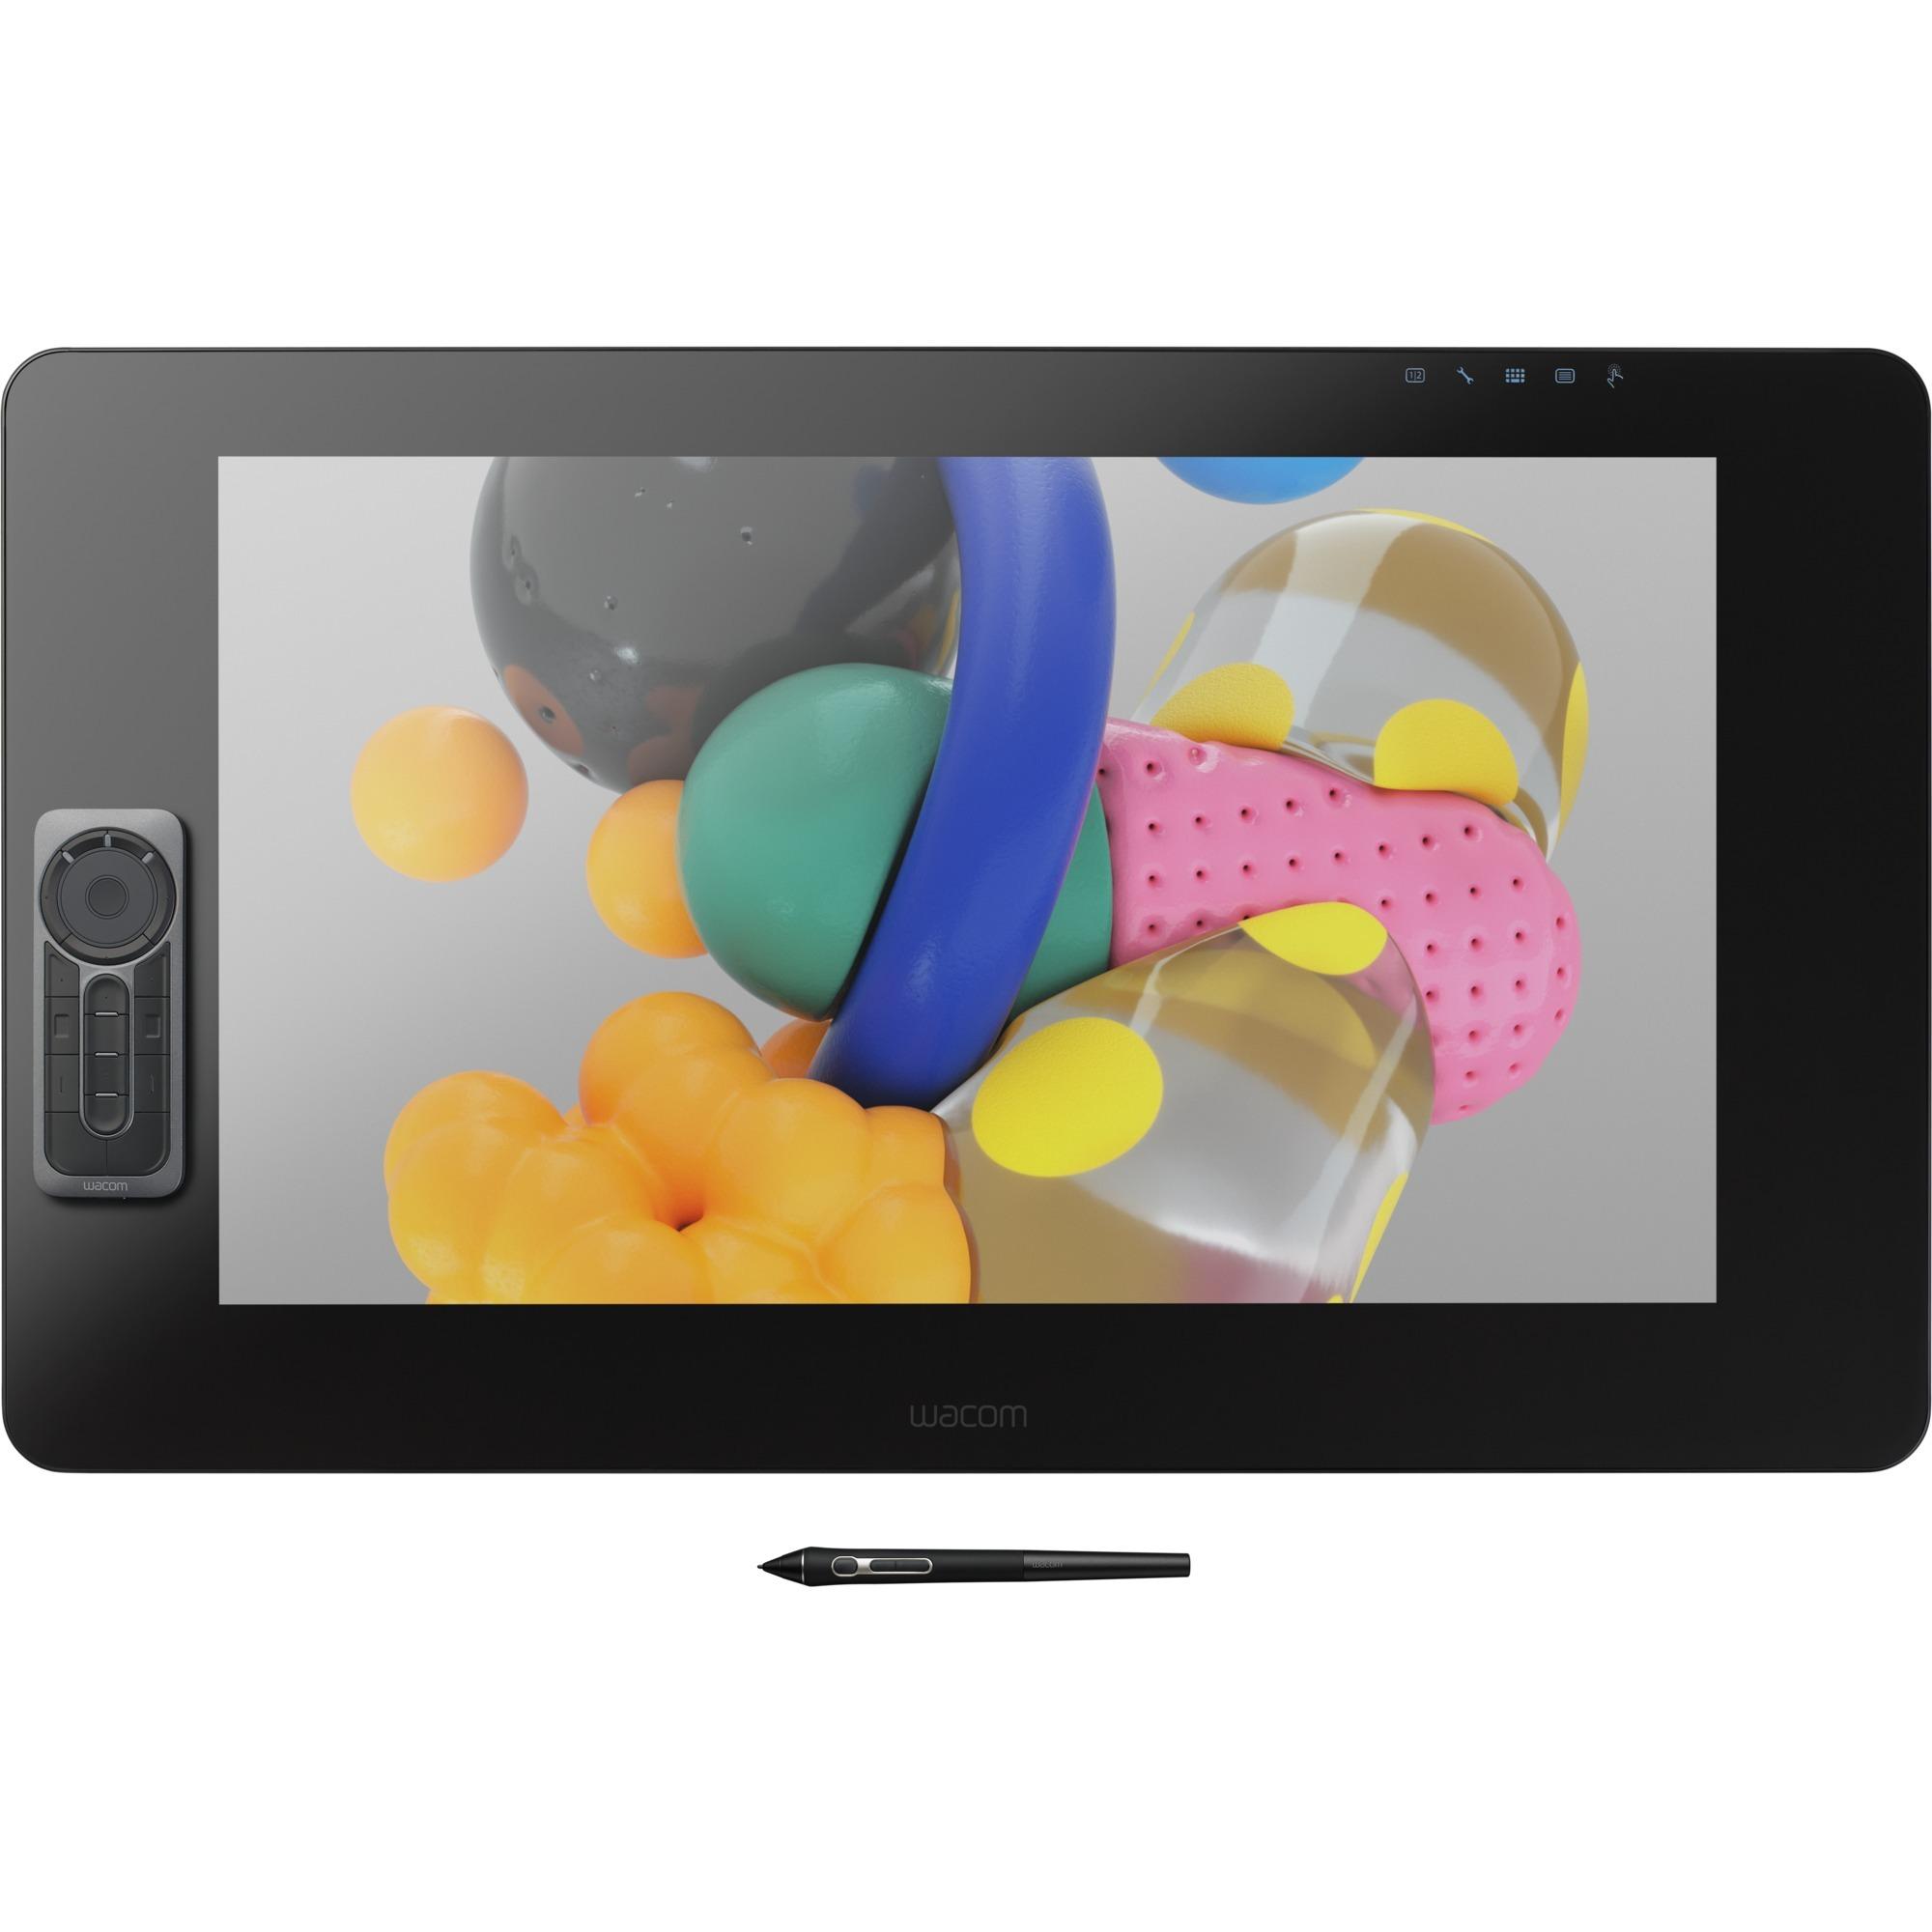 Cintiq Pro 24 tableta digitalizadora 5080 líneas por pulgada 522 x 294 mm USB Negro, Tableta gráfica